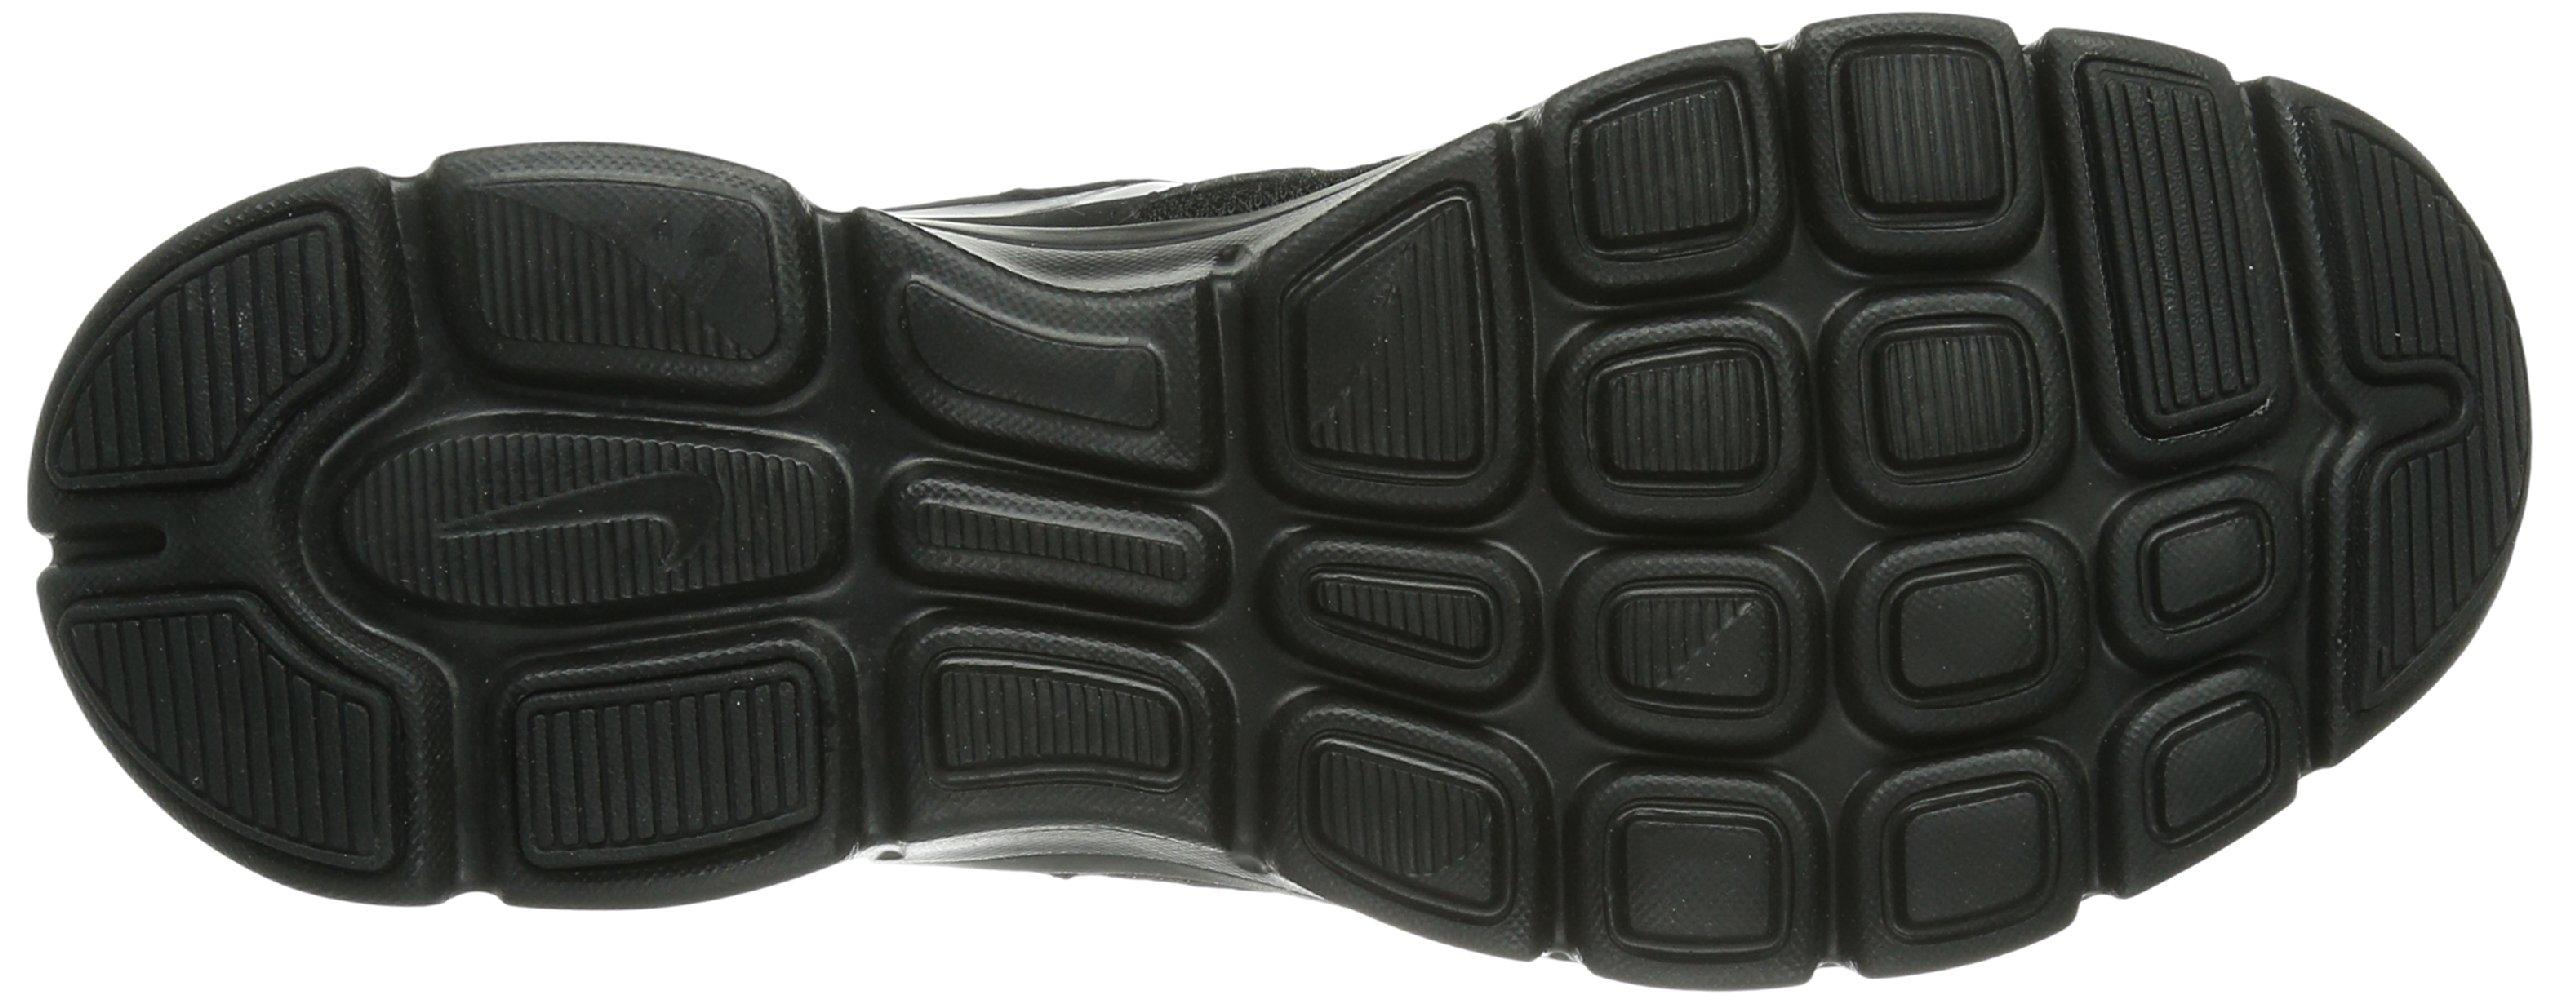 81Q6L9oWFIL - Nike Women's sneakers